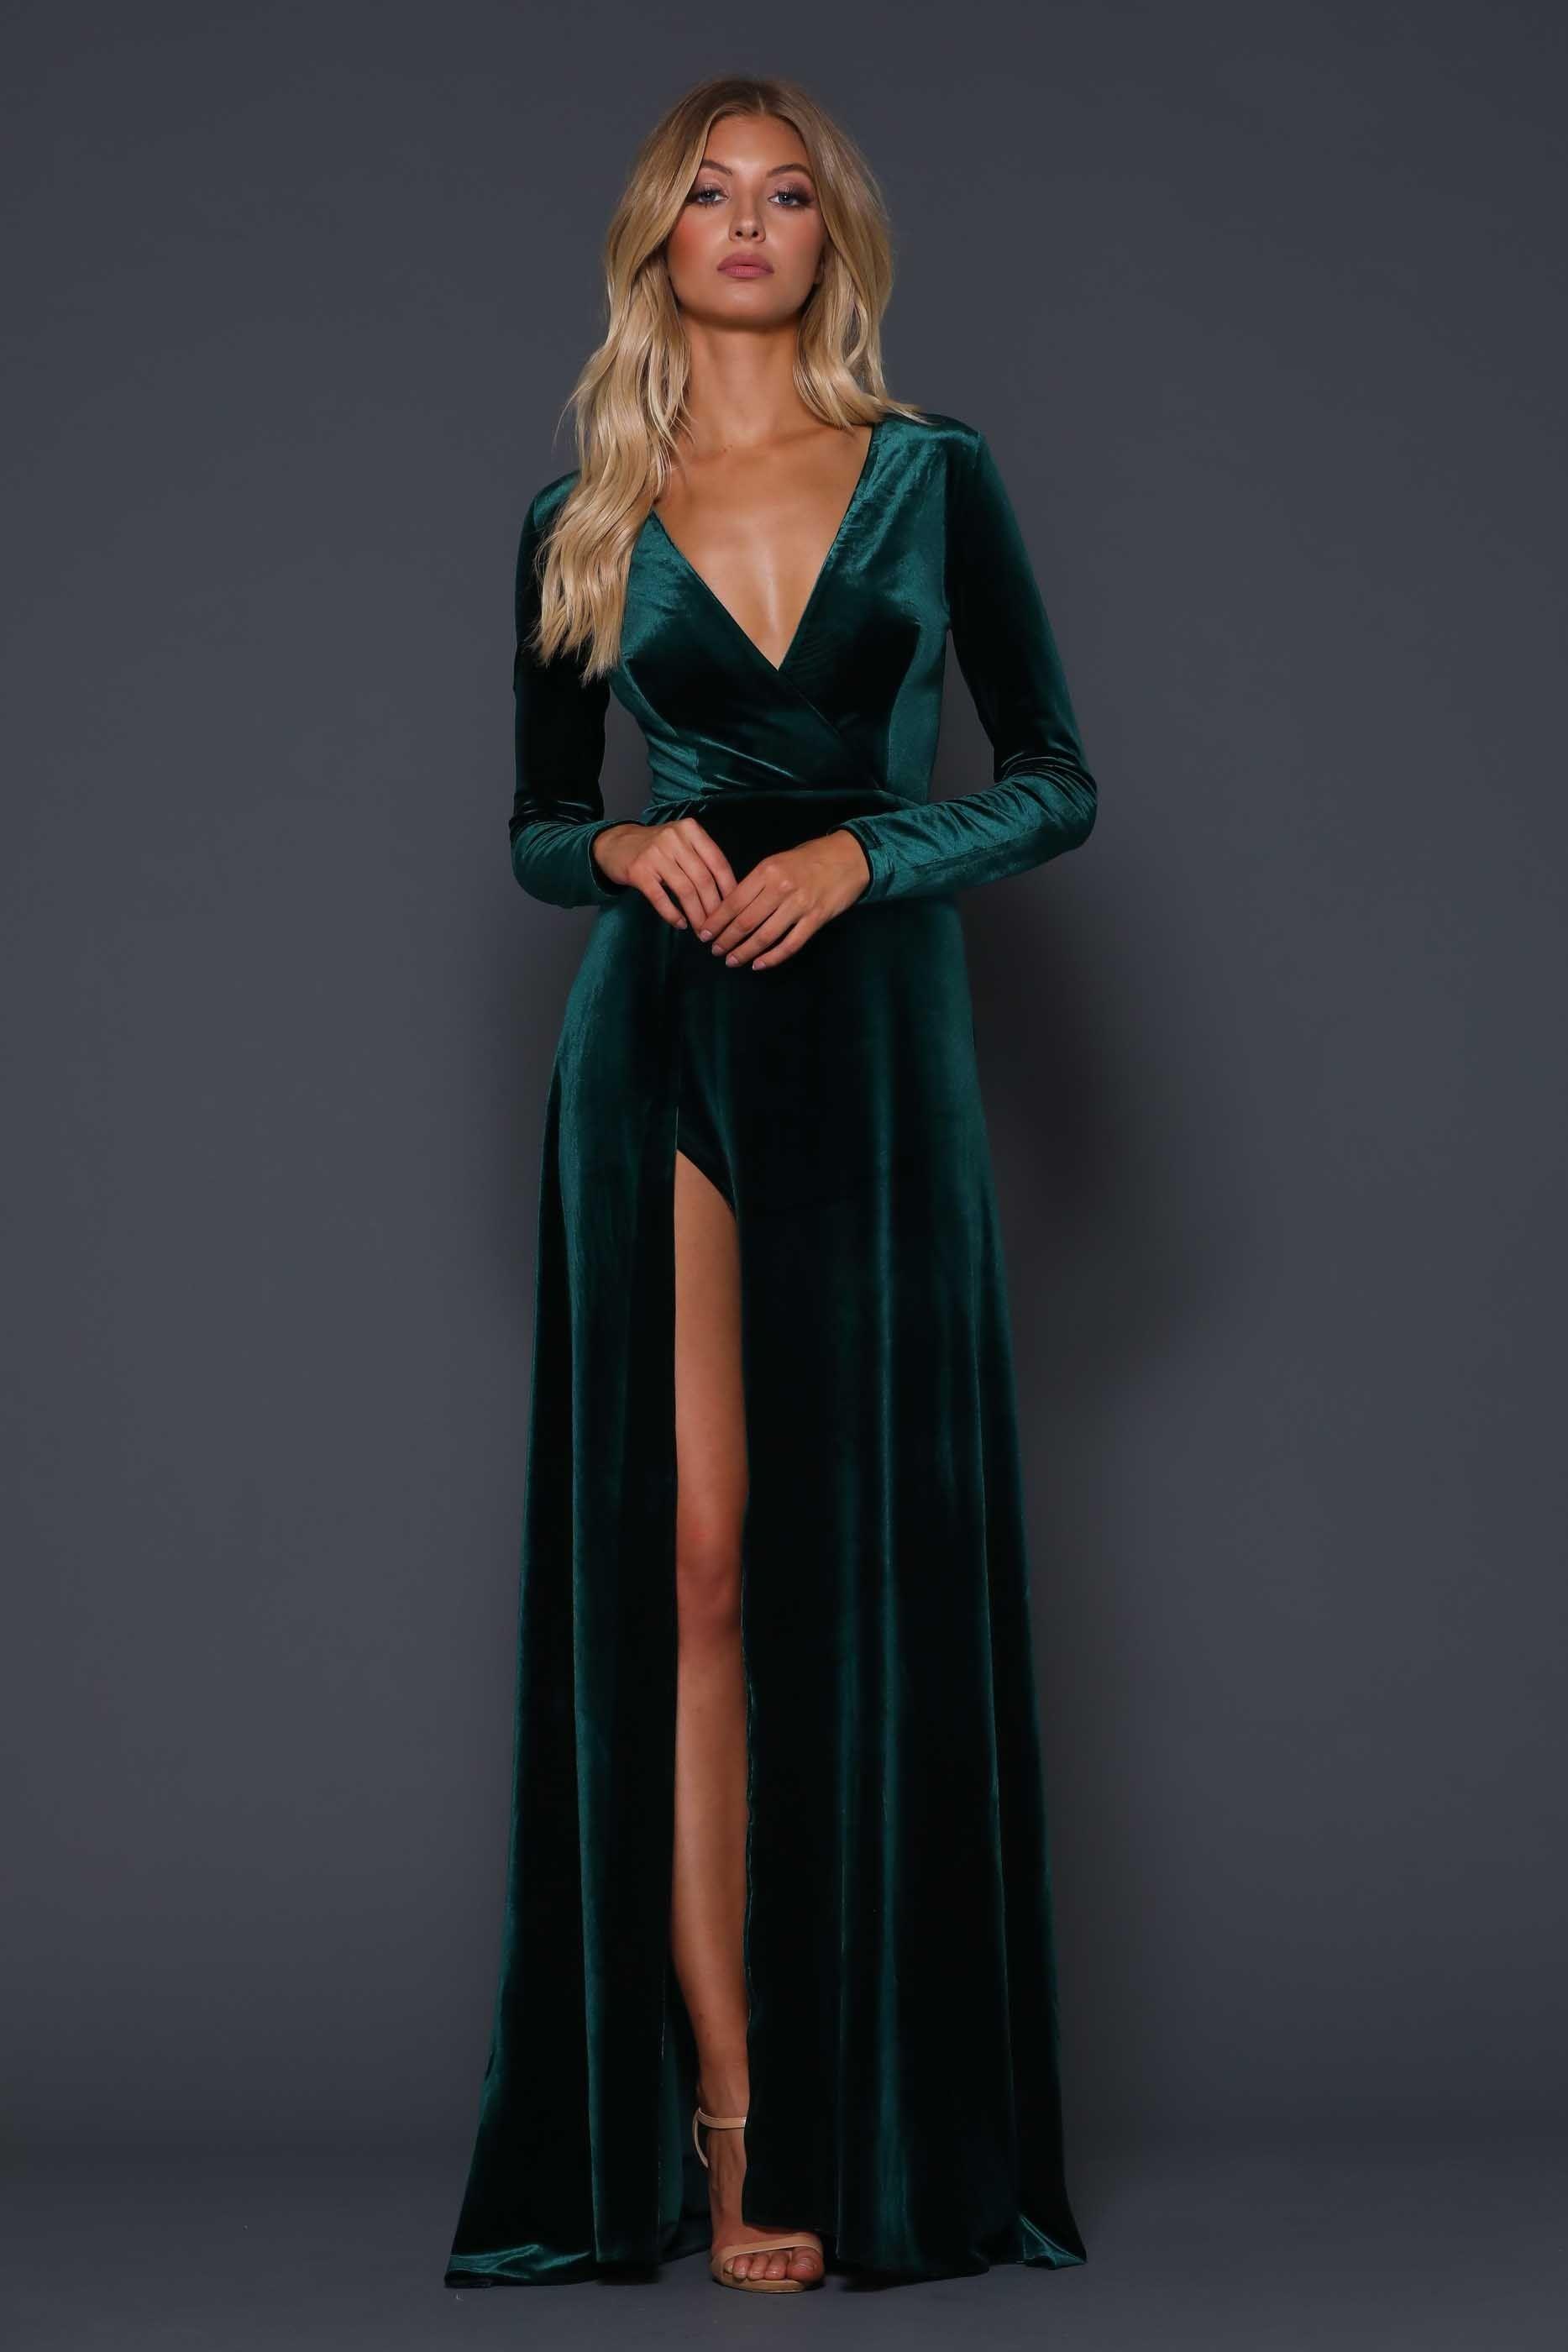 Emerald wedding dress  Fontaine Emerald Green  Cinderella WISHES in   Pinterest